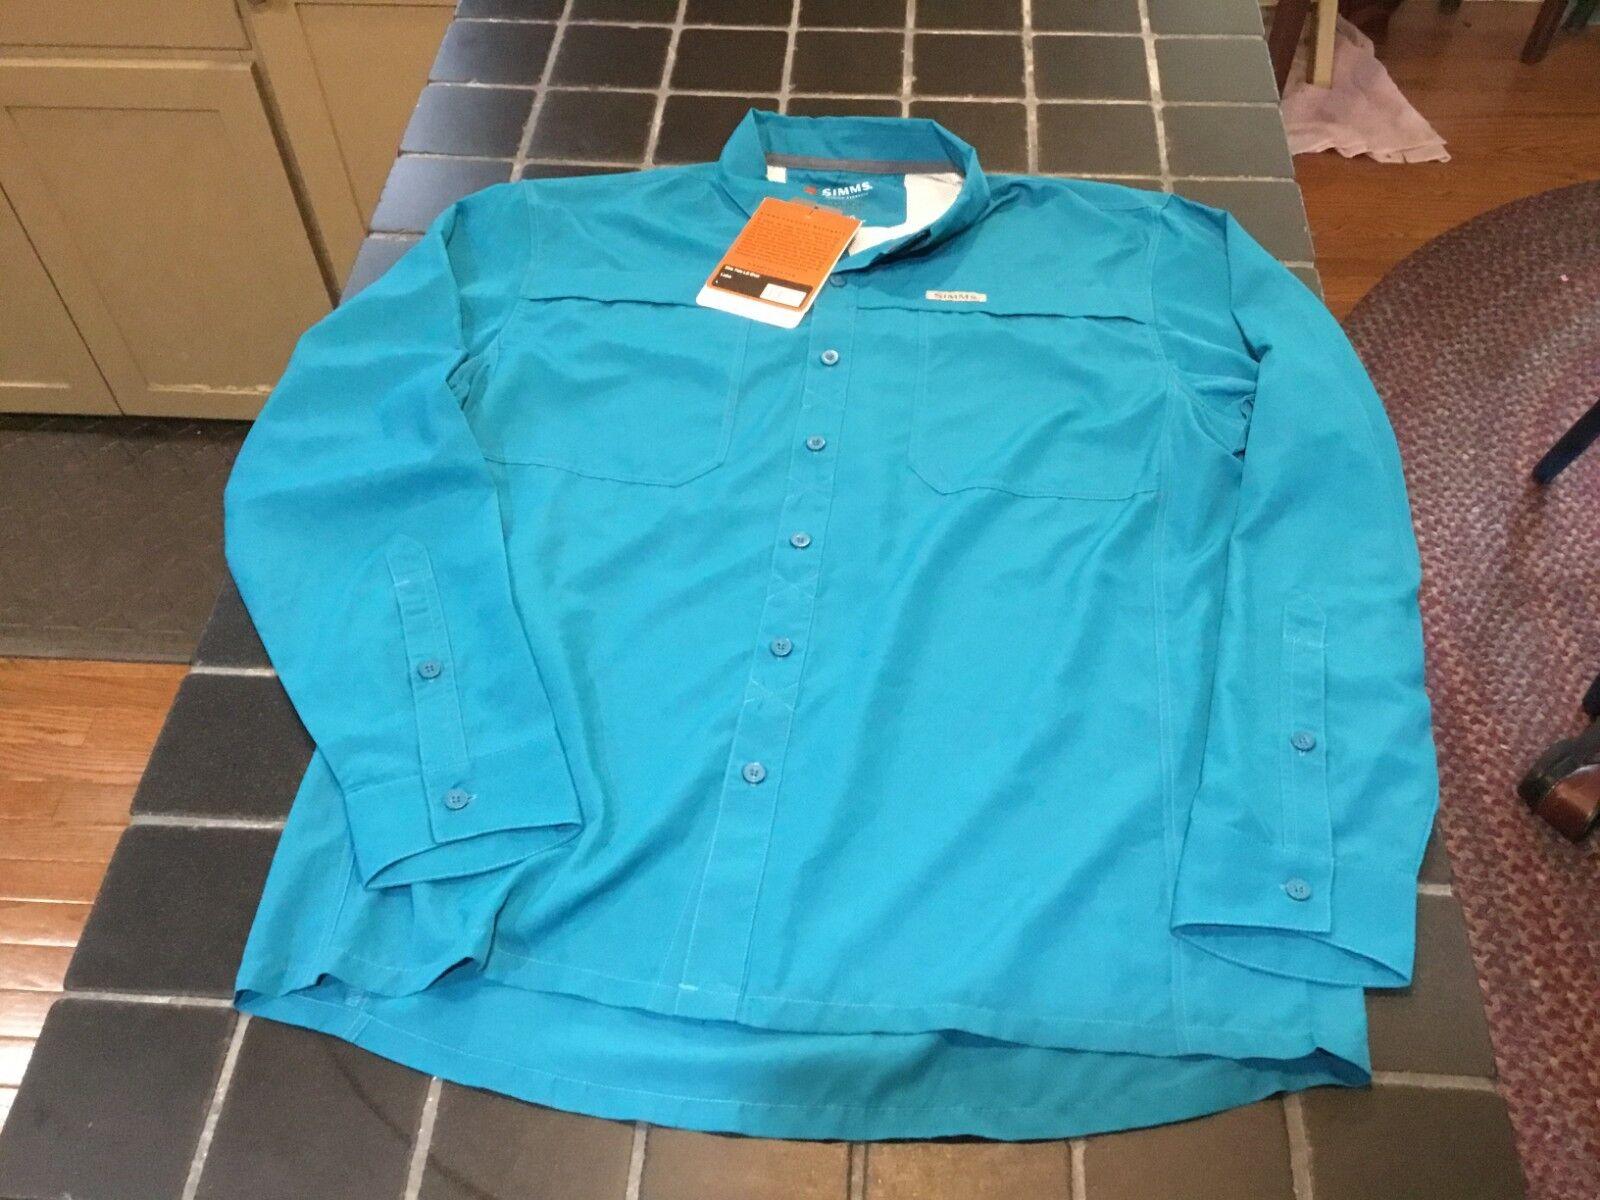 NWT Simms Fishing Ebb Tide LS Shirt, Size L, Lake color Fly Fishing Shirt